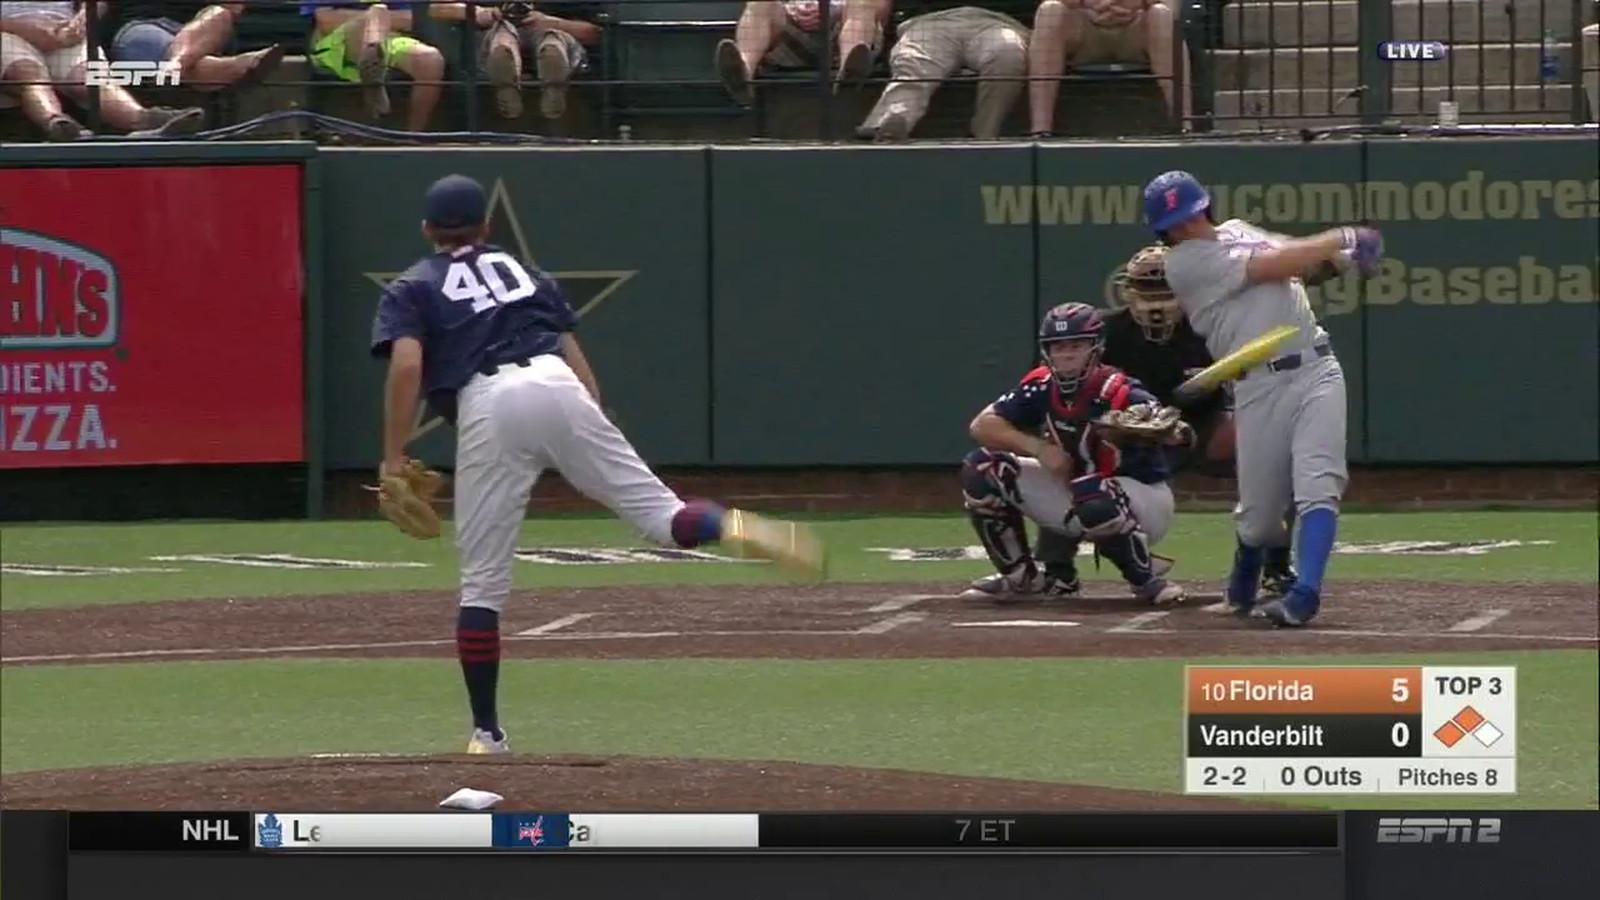 College Baseball Player Breaks His Dang Metal Bat On A